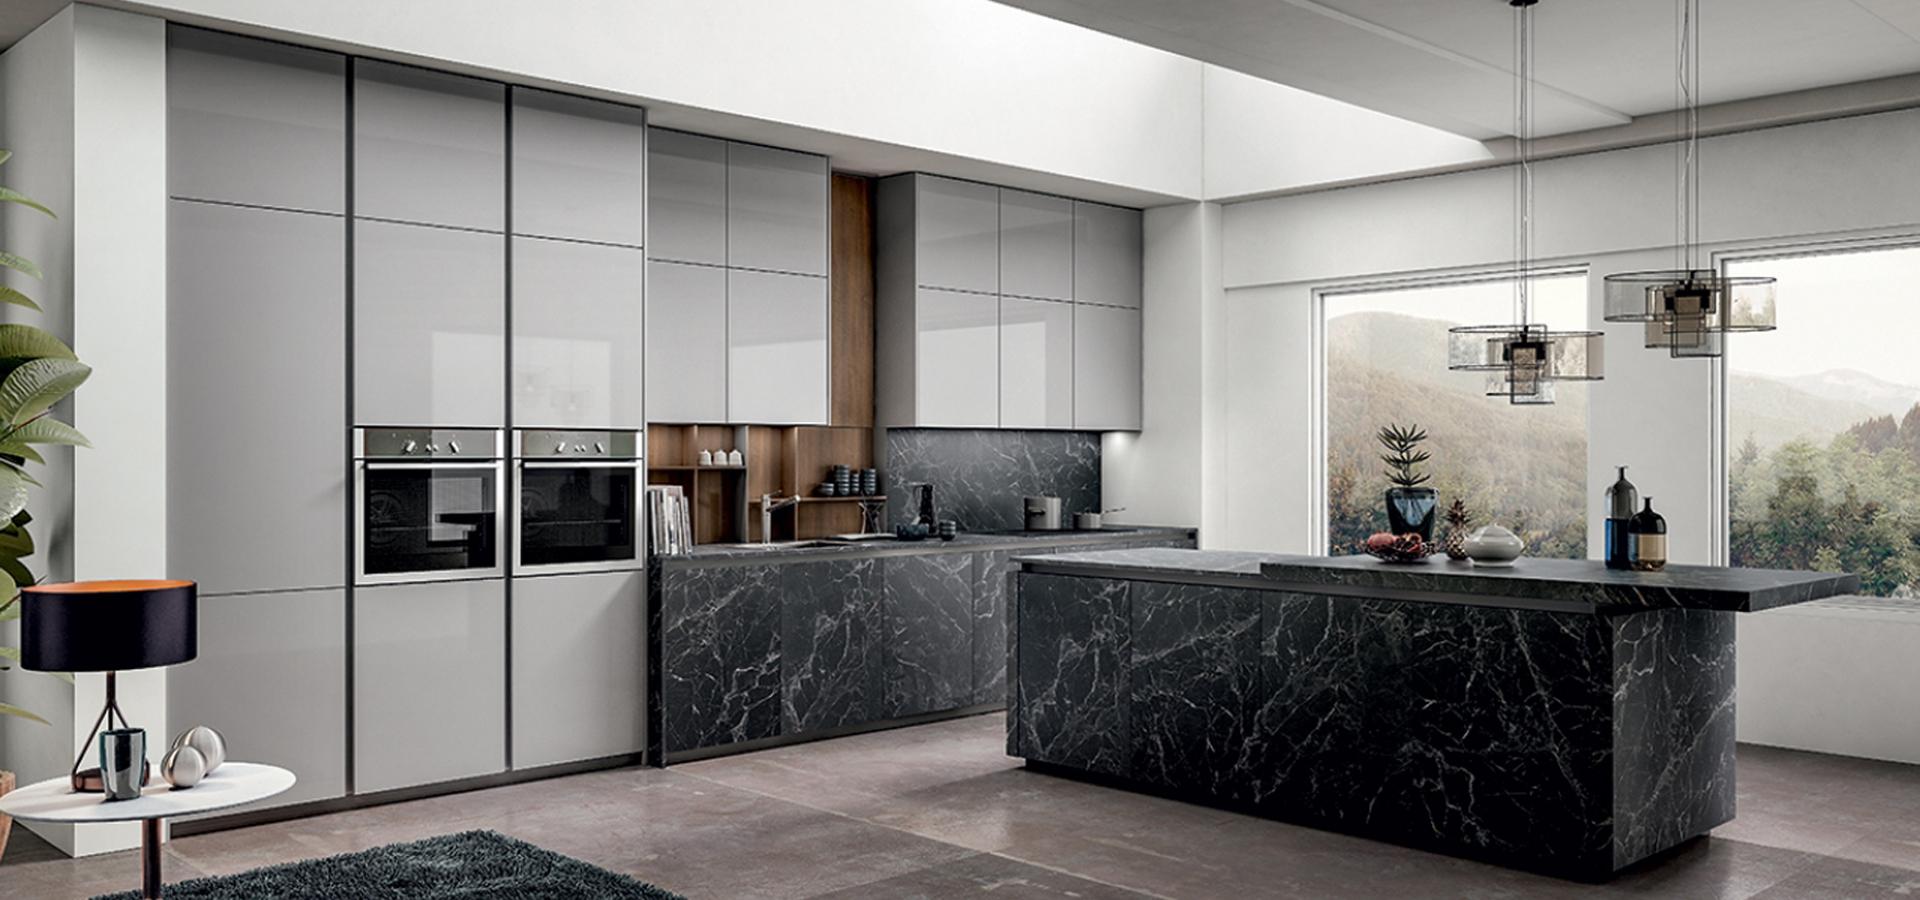 Arredo3-Cucina-Zetasei-5-moderna-design-componibile-angolo-cottura ...